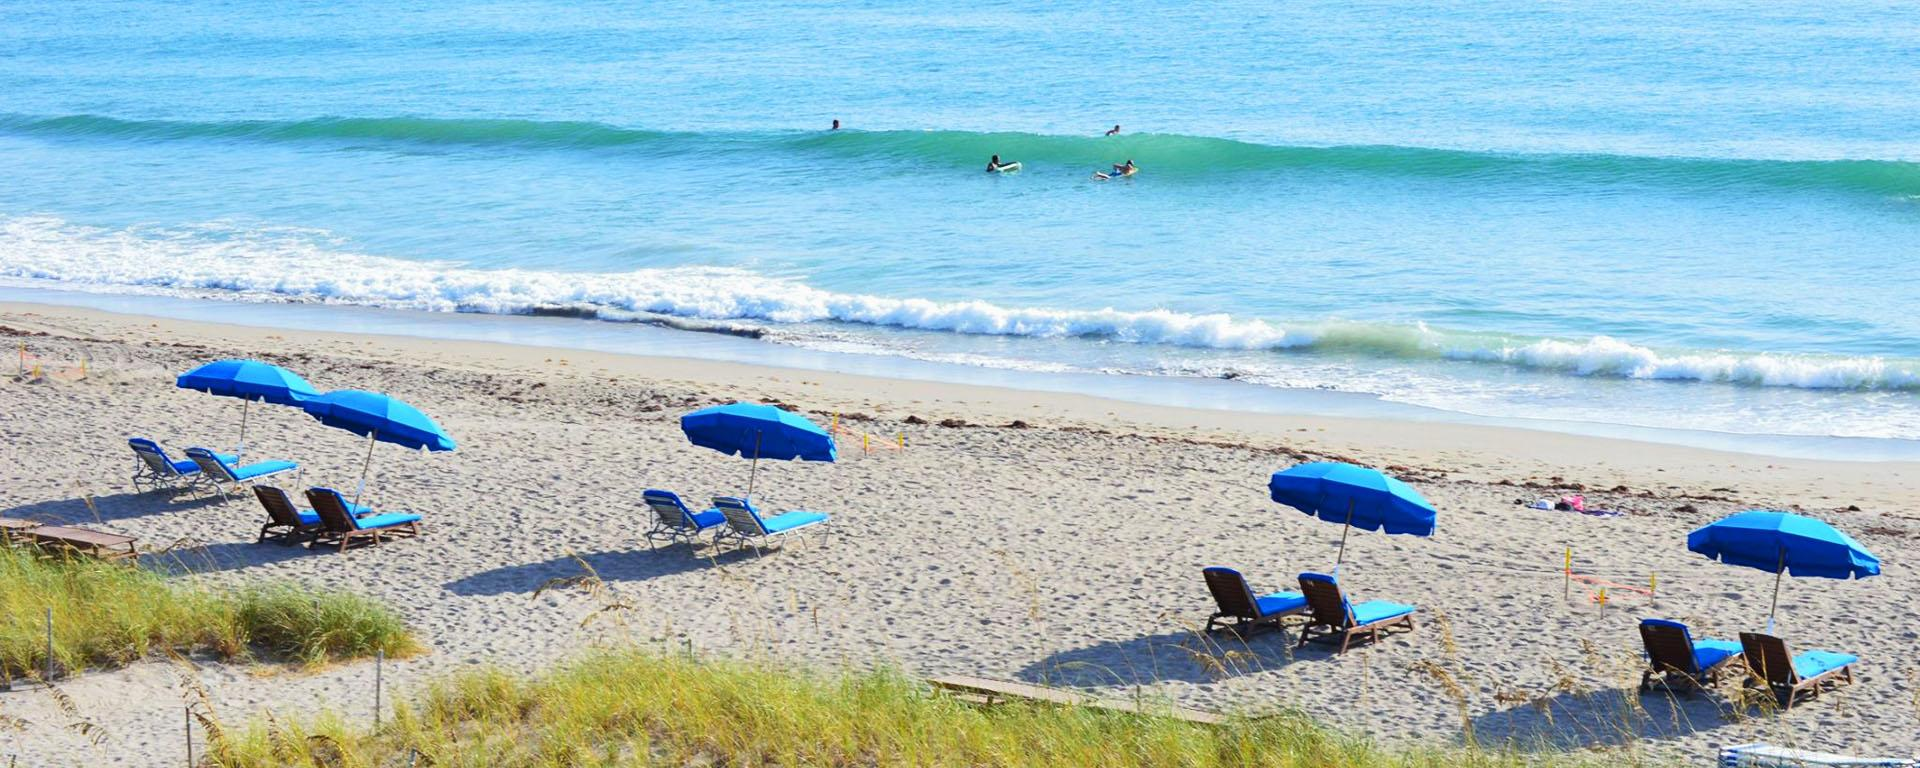 Jensen Sea Turtle Beach/Sand Dune Cafe Image